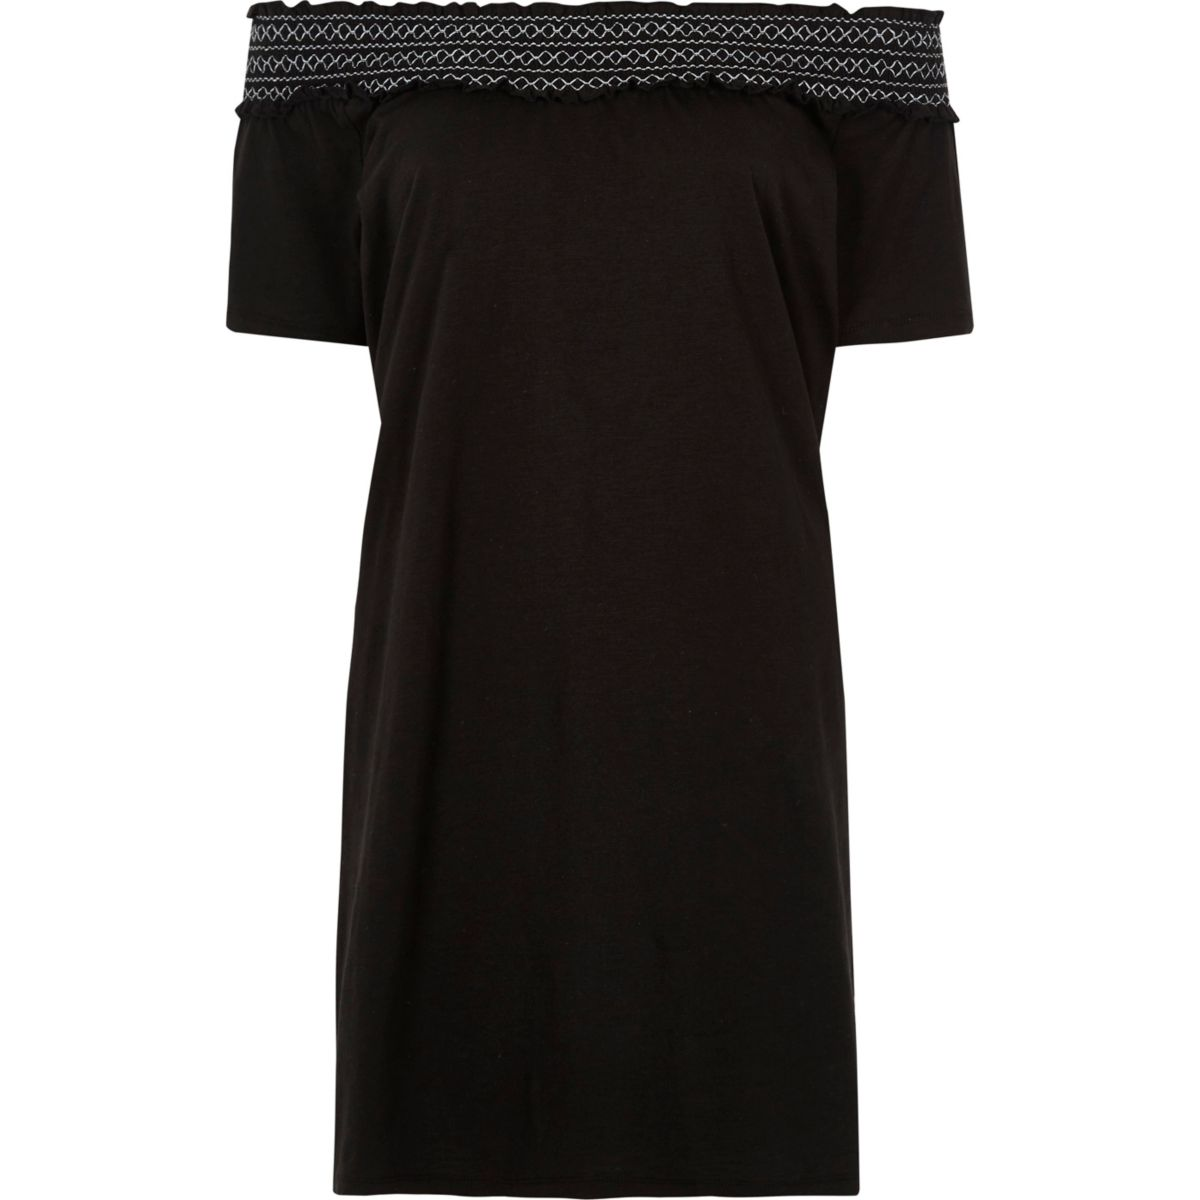 Schwarzes, kurzärmliges, gesmoktes Bardot-Kleid